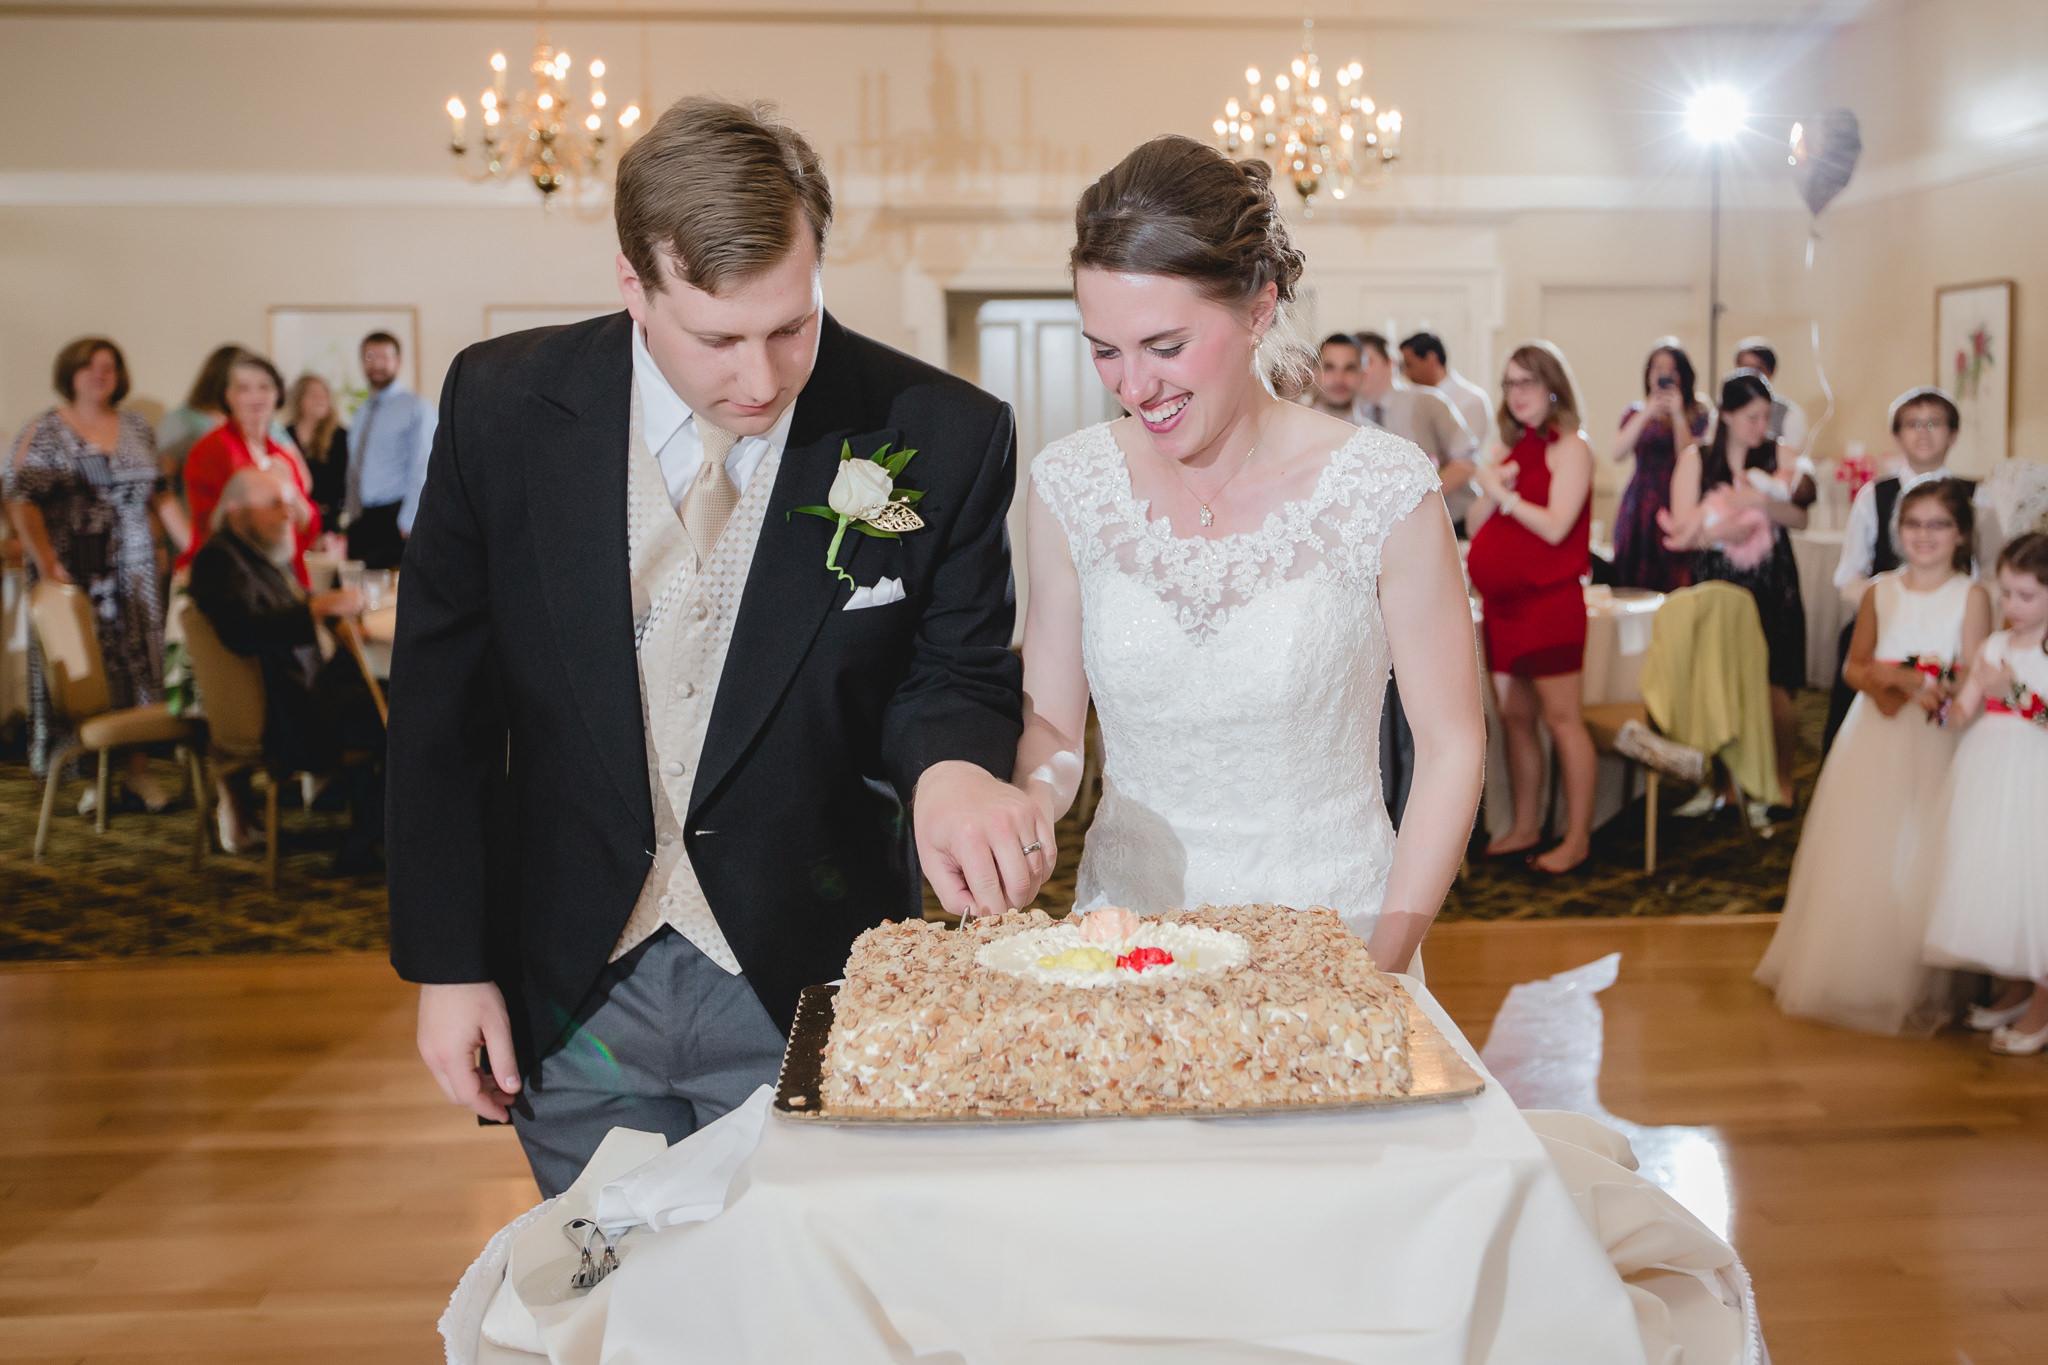 Newlyweds cutting their cake at Shannopin Country Club wedding reception